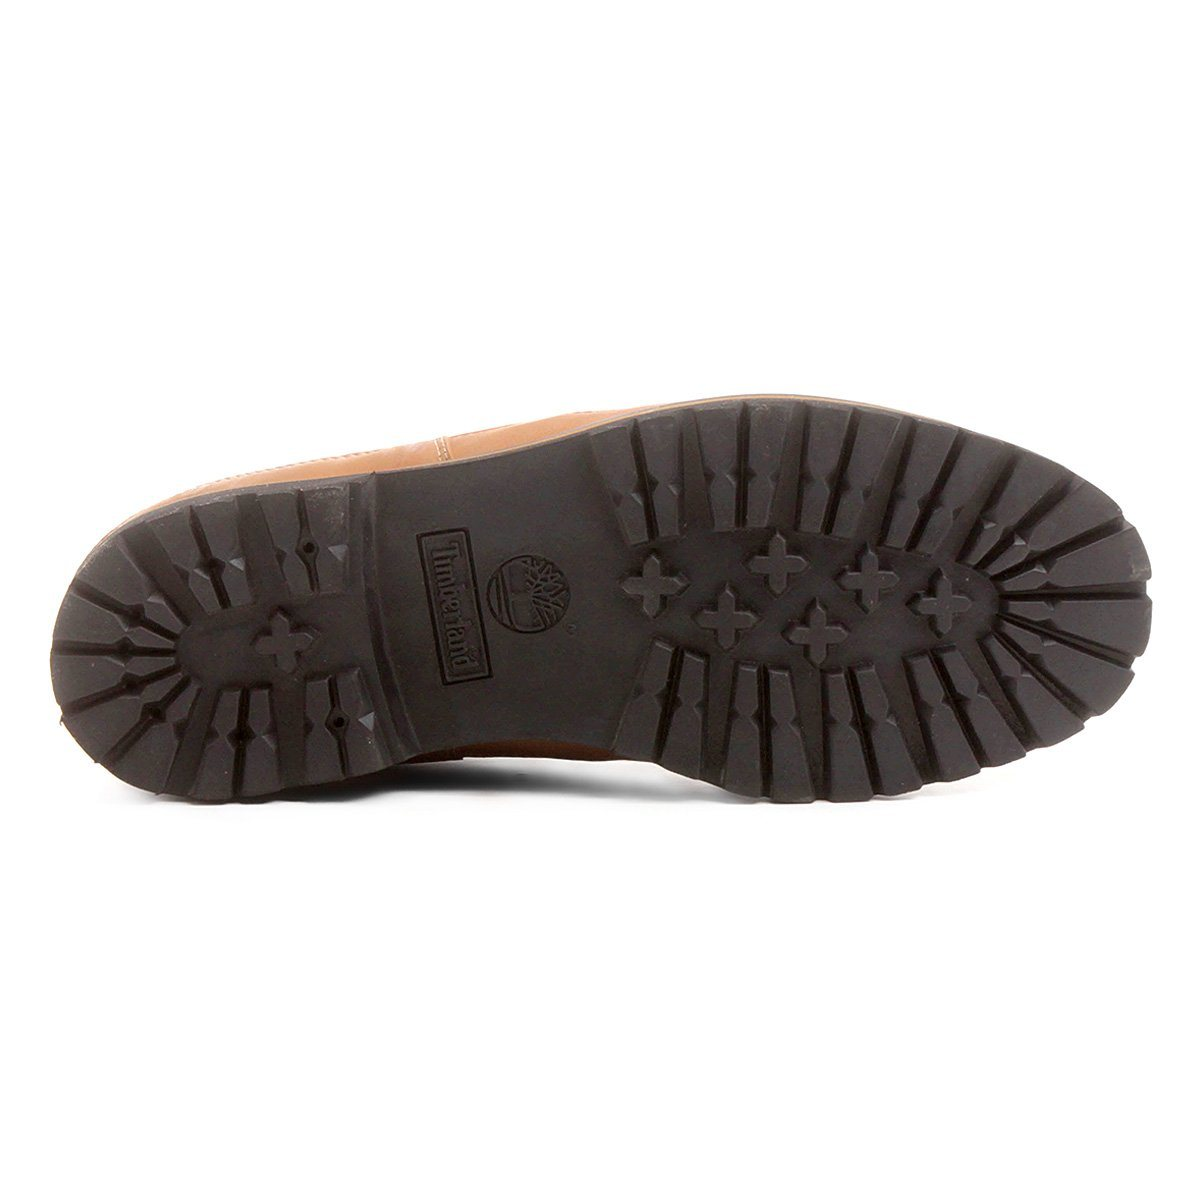 Bota Timberland Ek Leather Chukka Os